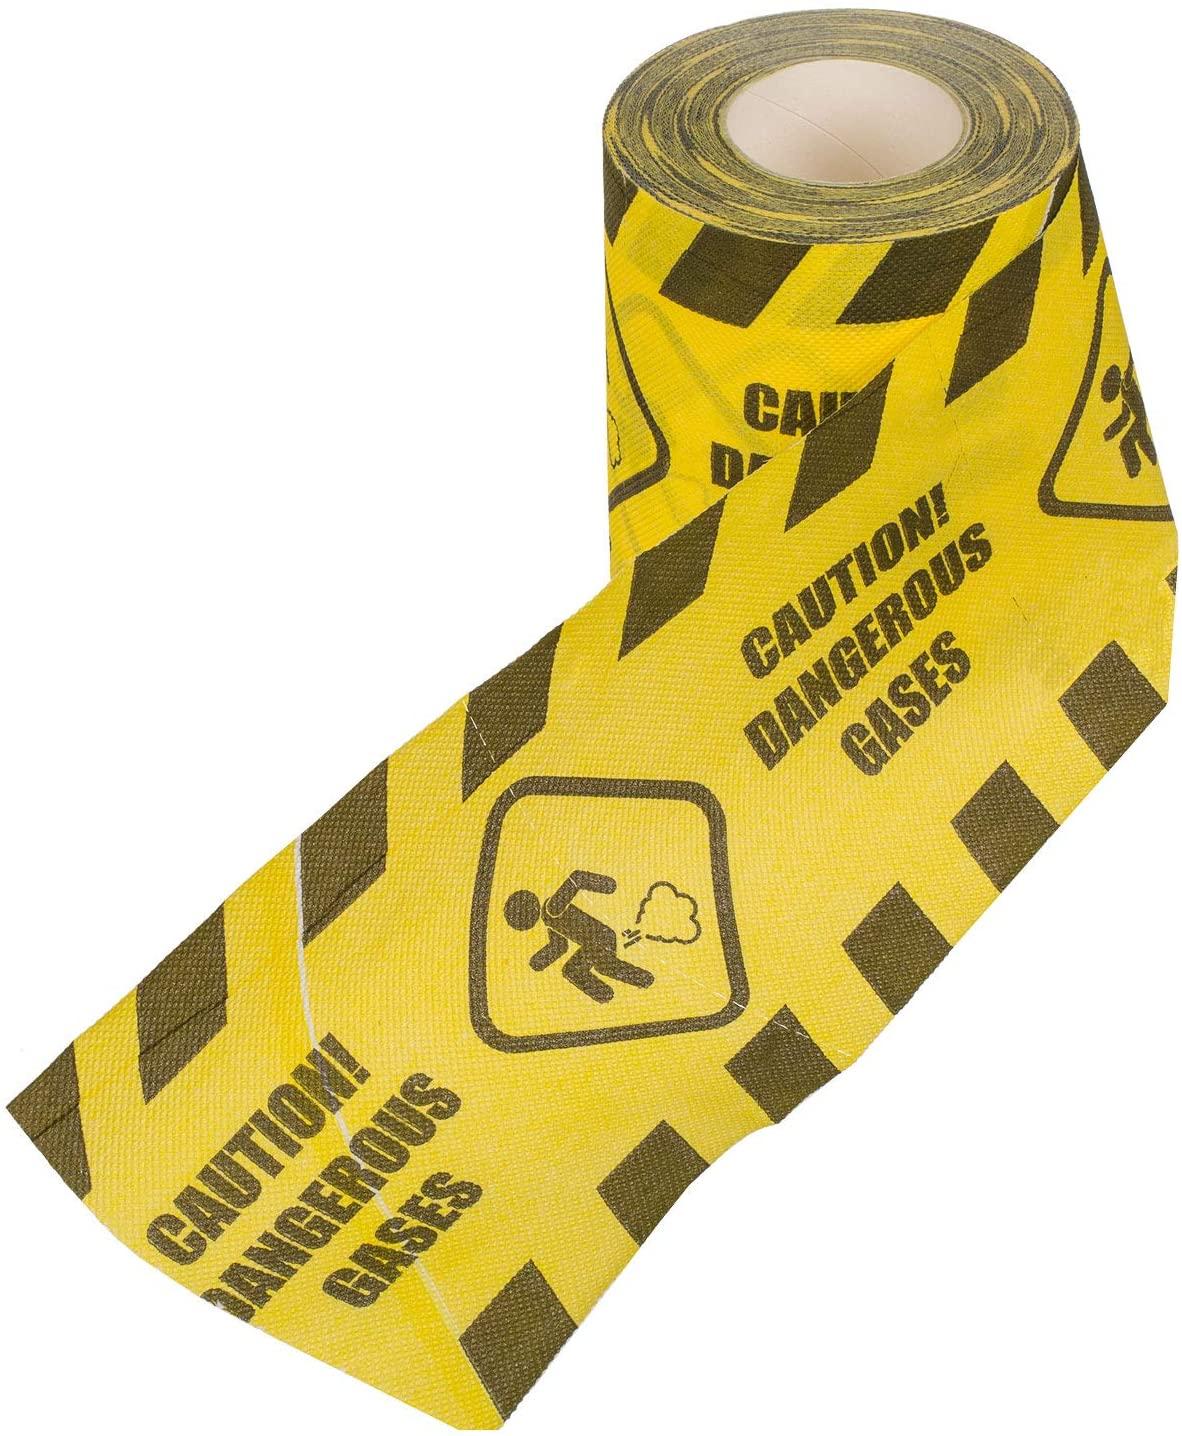 Out of the Blue Caution Dangerous Gases 33/0047 Toilet Paper